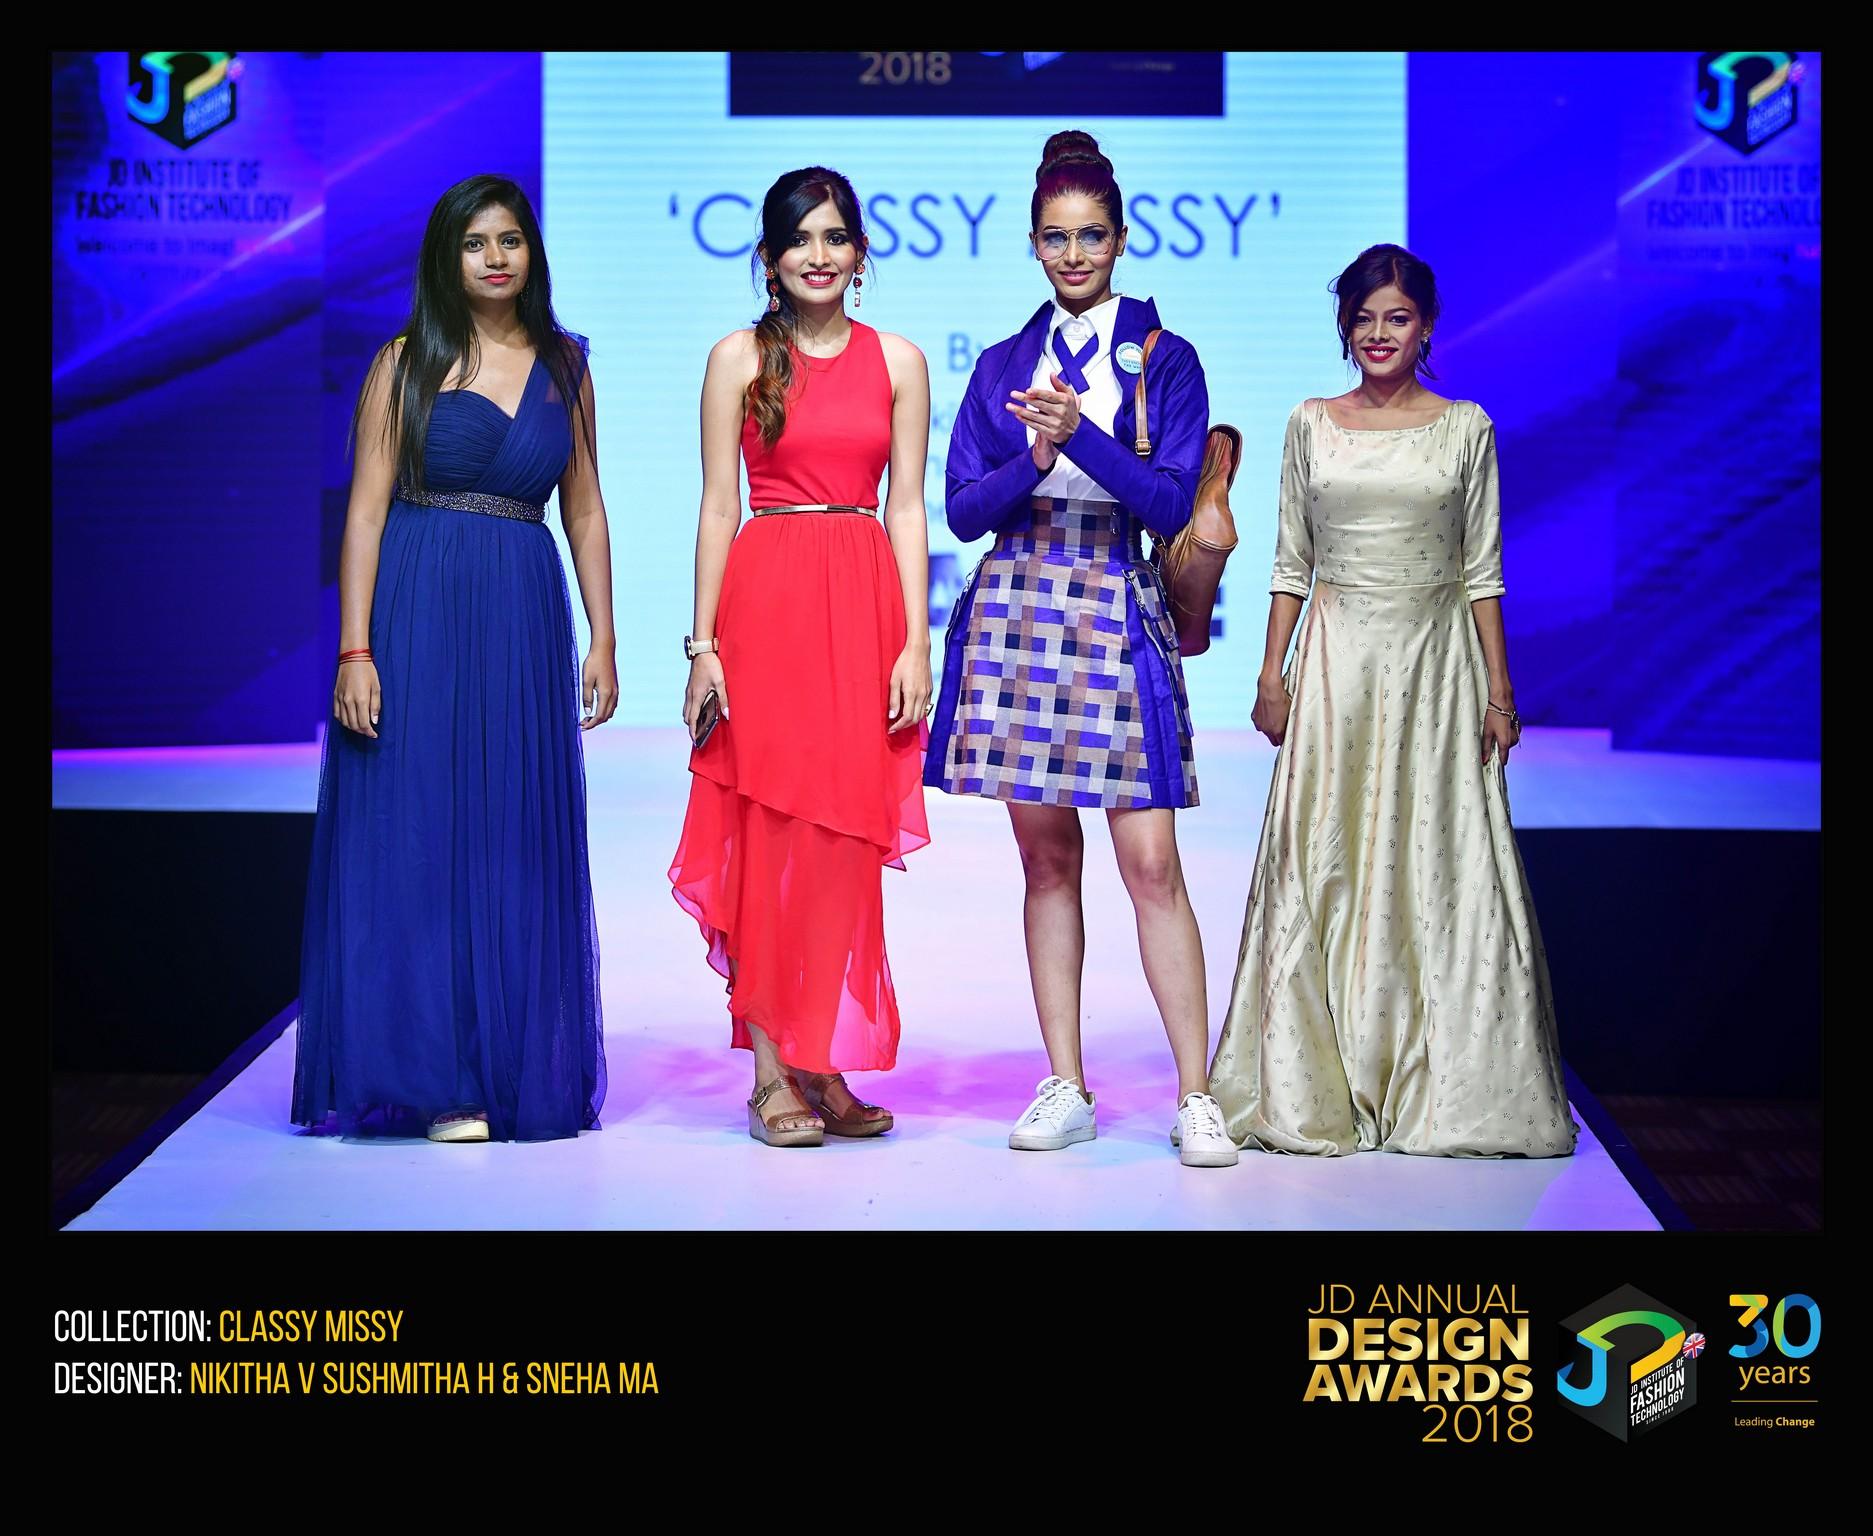 Classy Missy – Change – JD Annual Design Awards 2018 | Designer: Sneha, Nikita and Sushmita | Photography : Jerin Nath (@jerin_nath) classy missy – change – jd annual design awards 2018 - CLASSY MISSY 8 1 - Classy Missy – Change – JD Annual Design Awards 2018